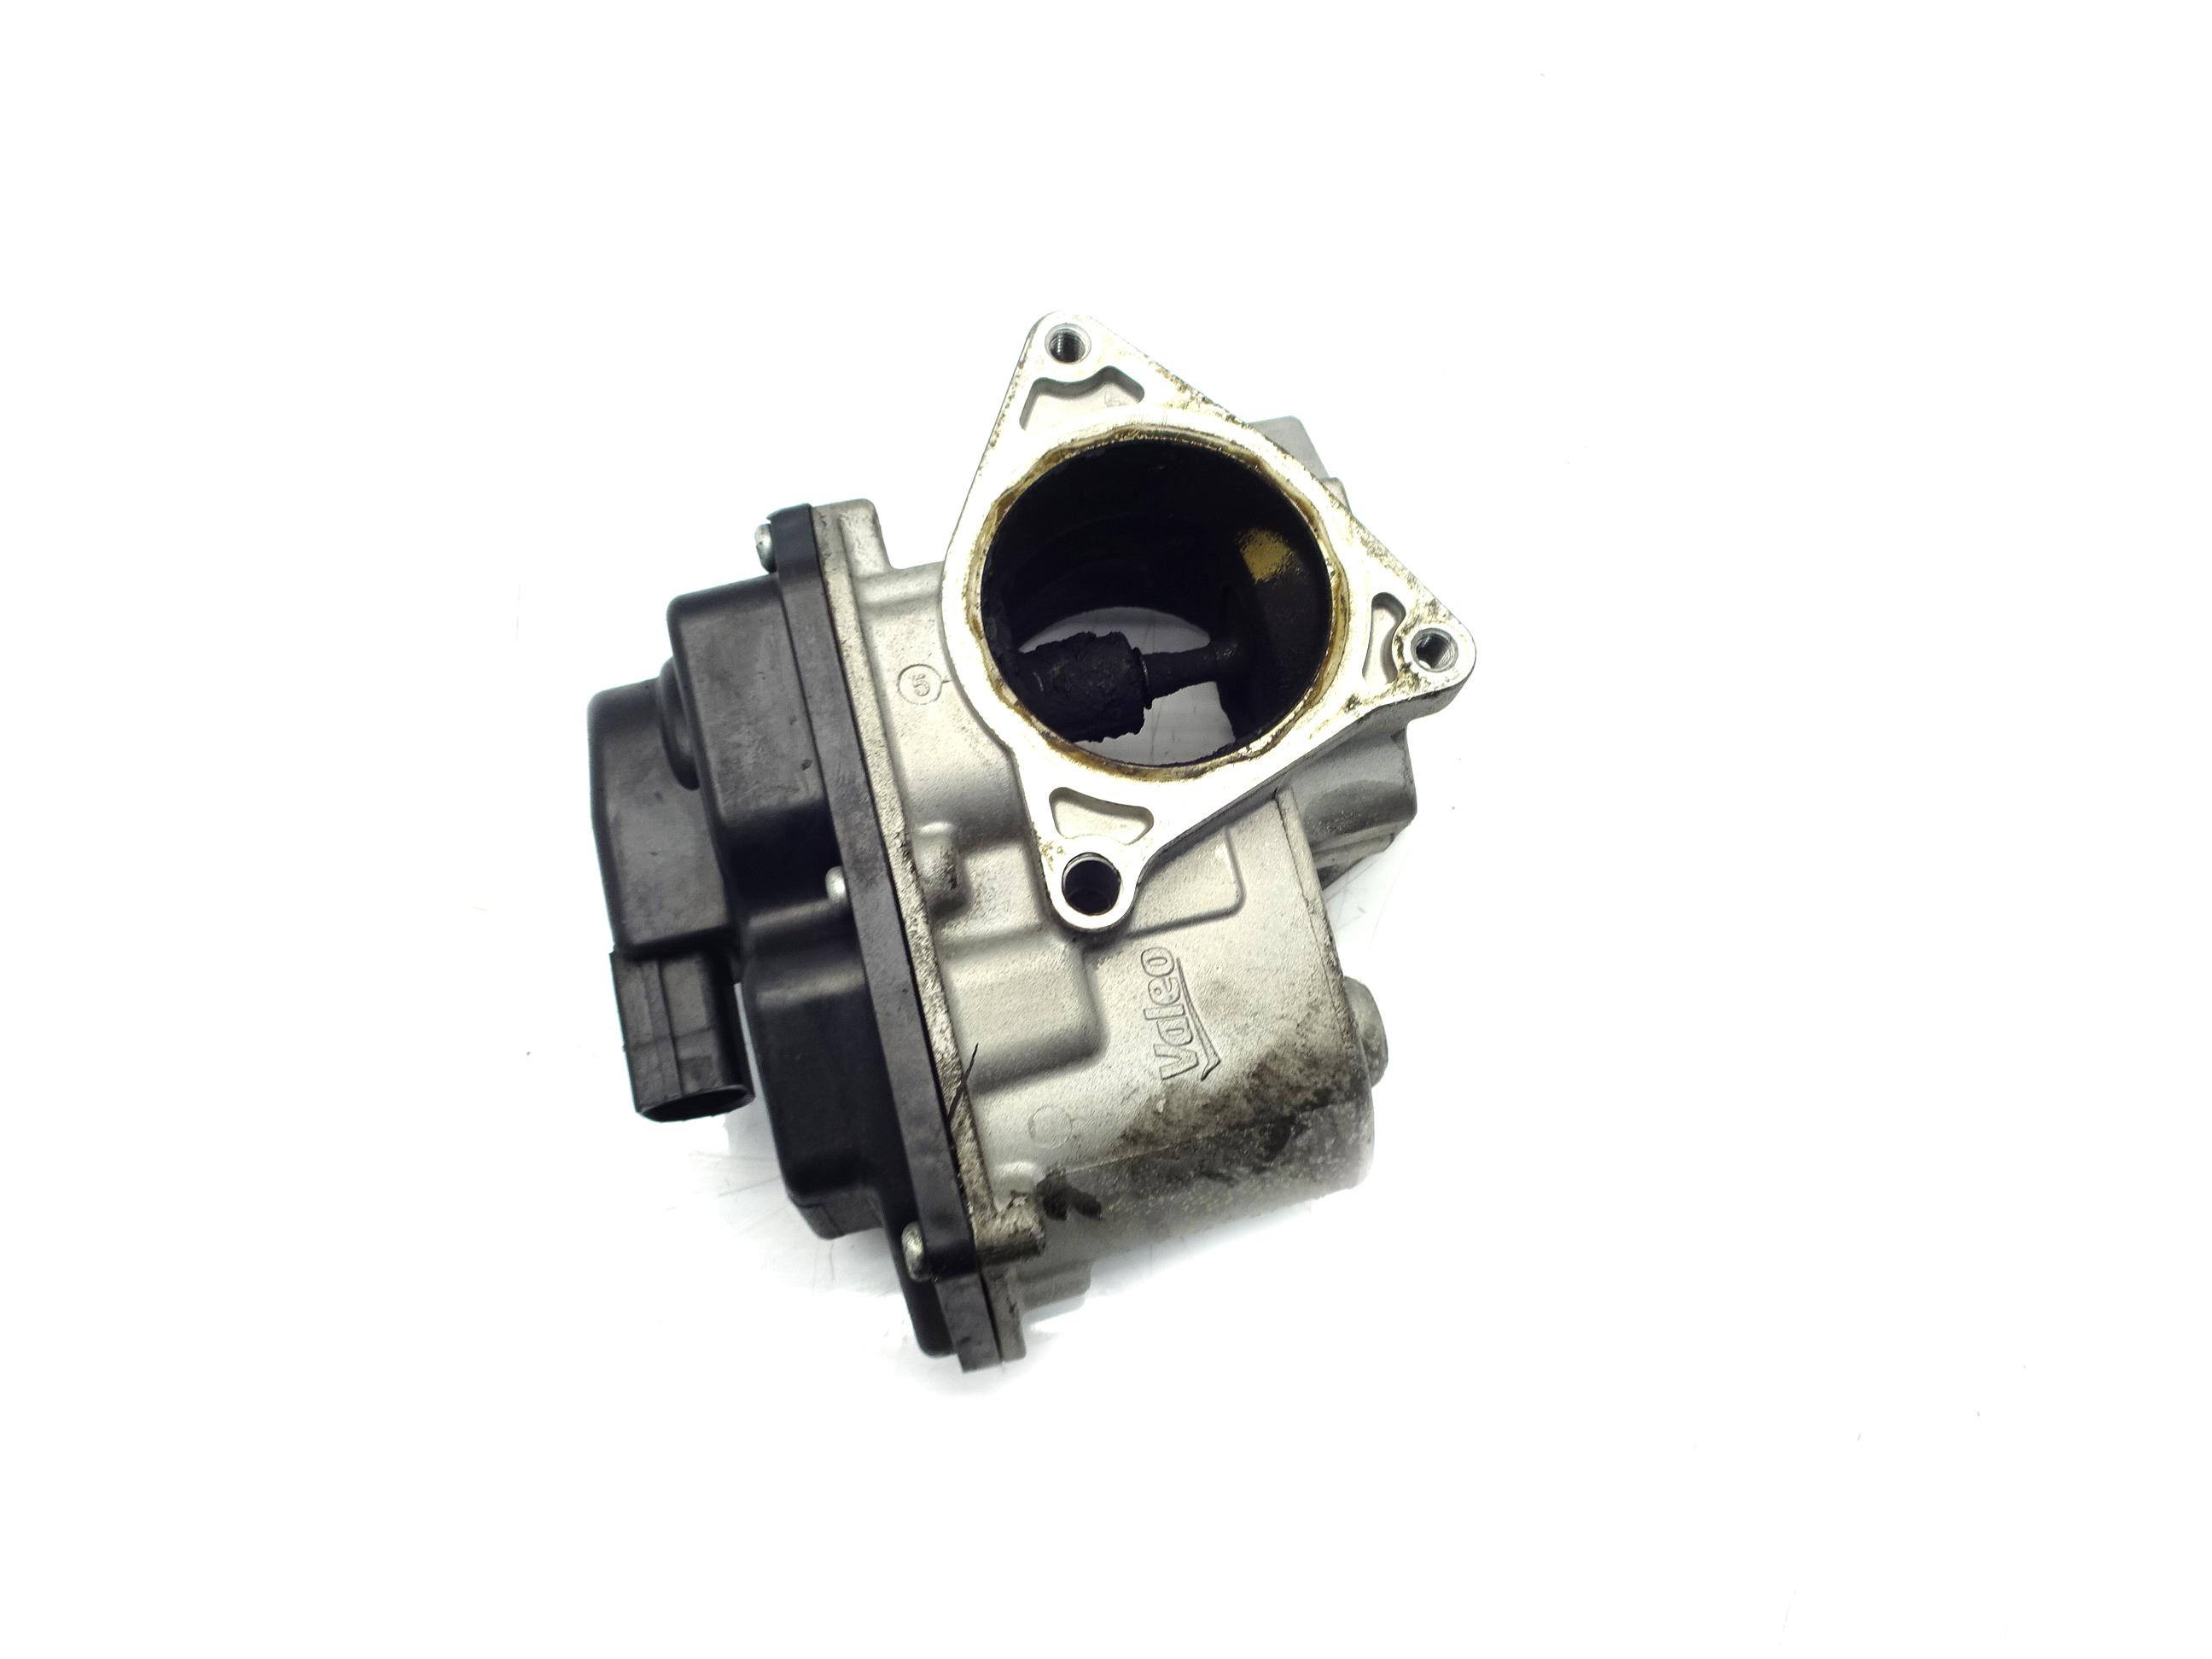 AGR Ventil VW Passat 3C2 3C5 2,0 TDI Diesel BMR 03G131501P